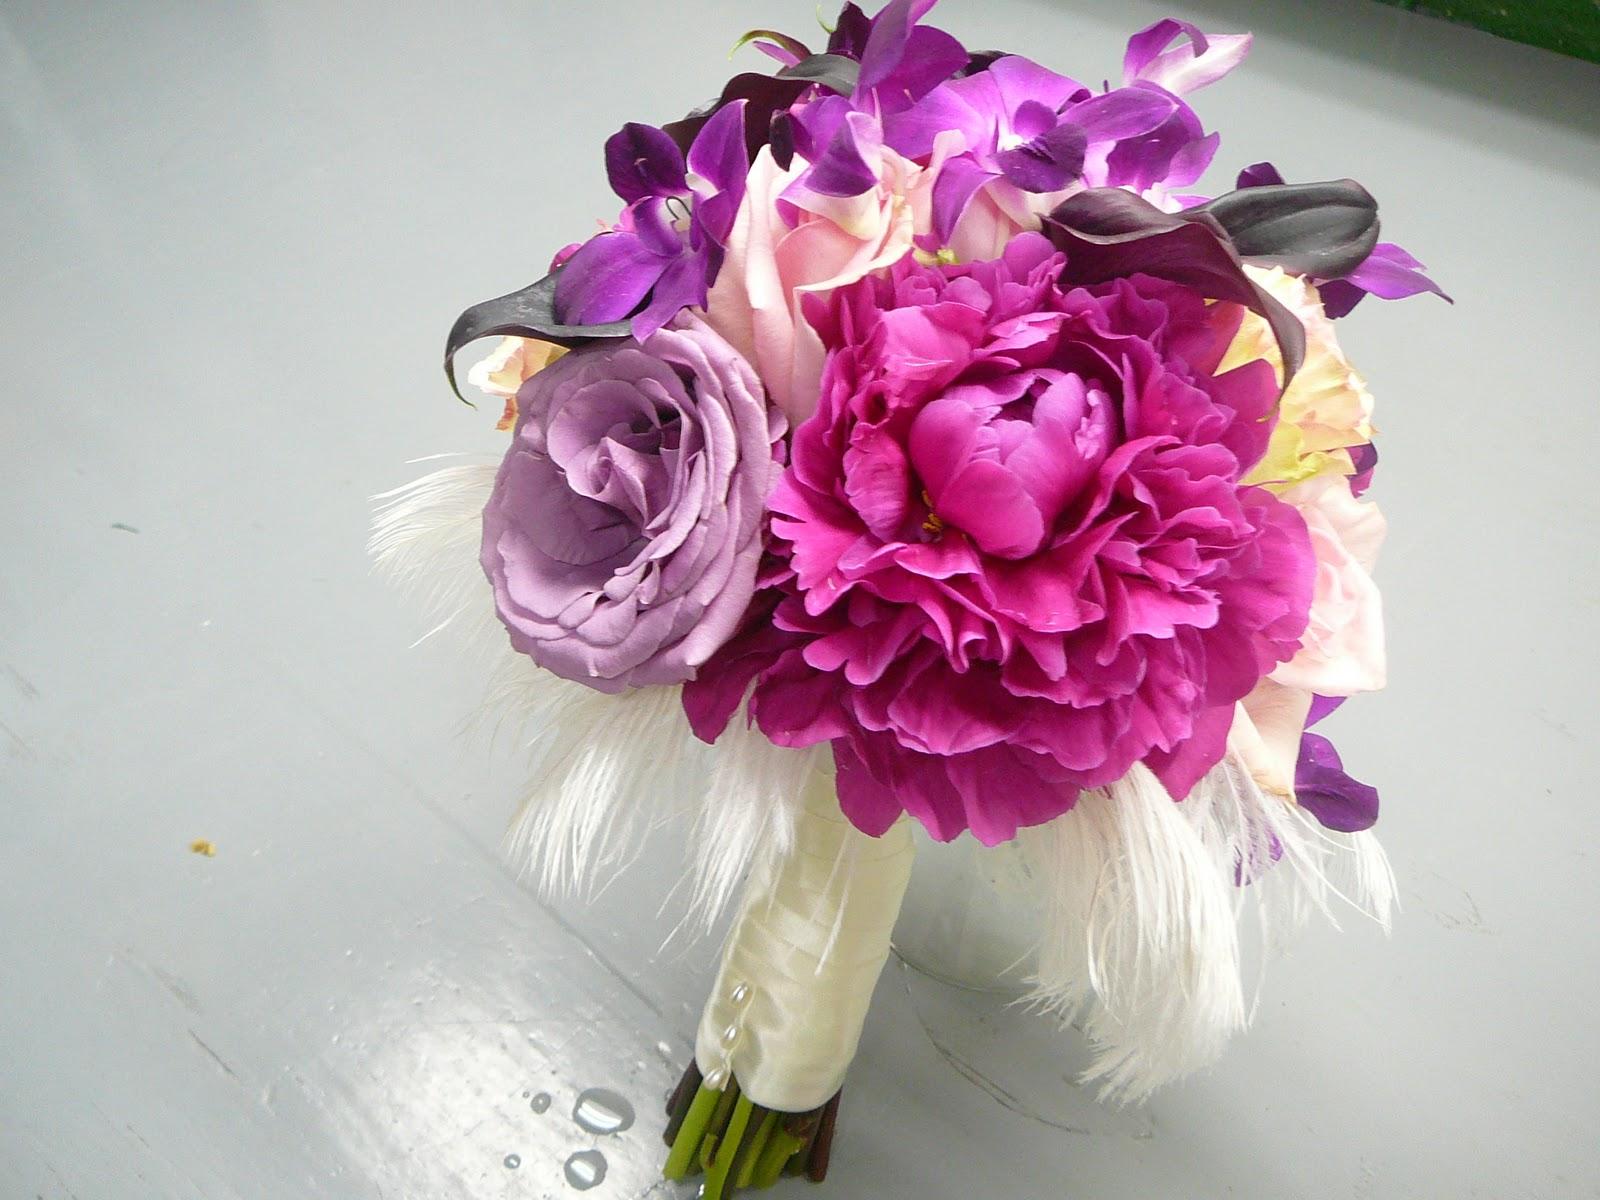 Flower and Event Decor. Ostrich Feather Centerpieces: Best Decor ...